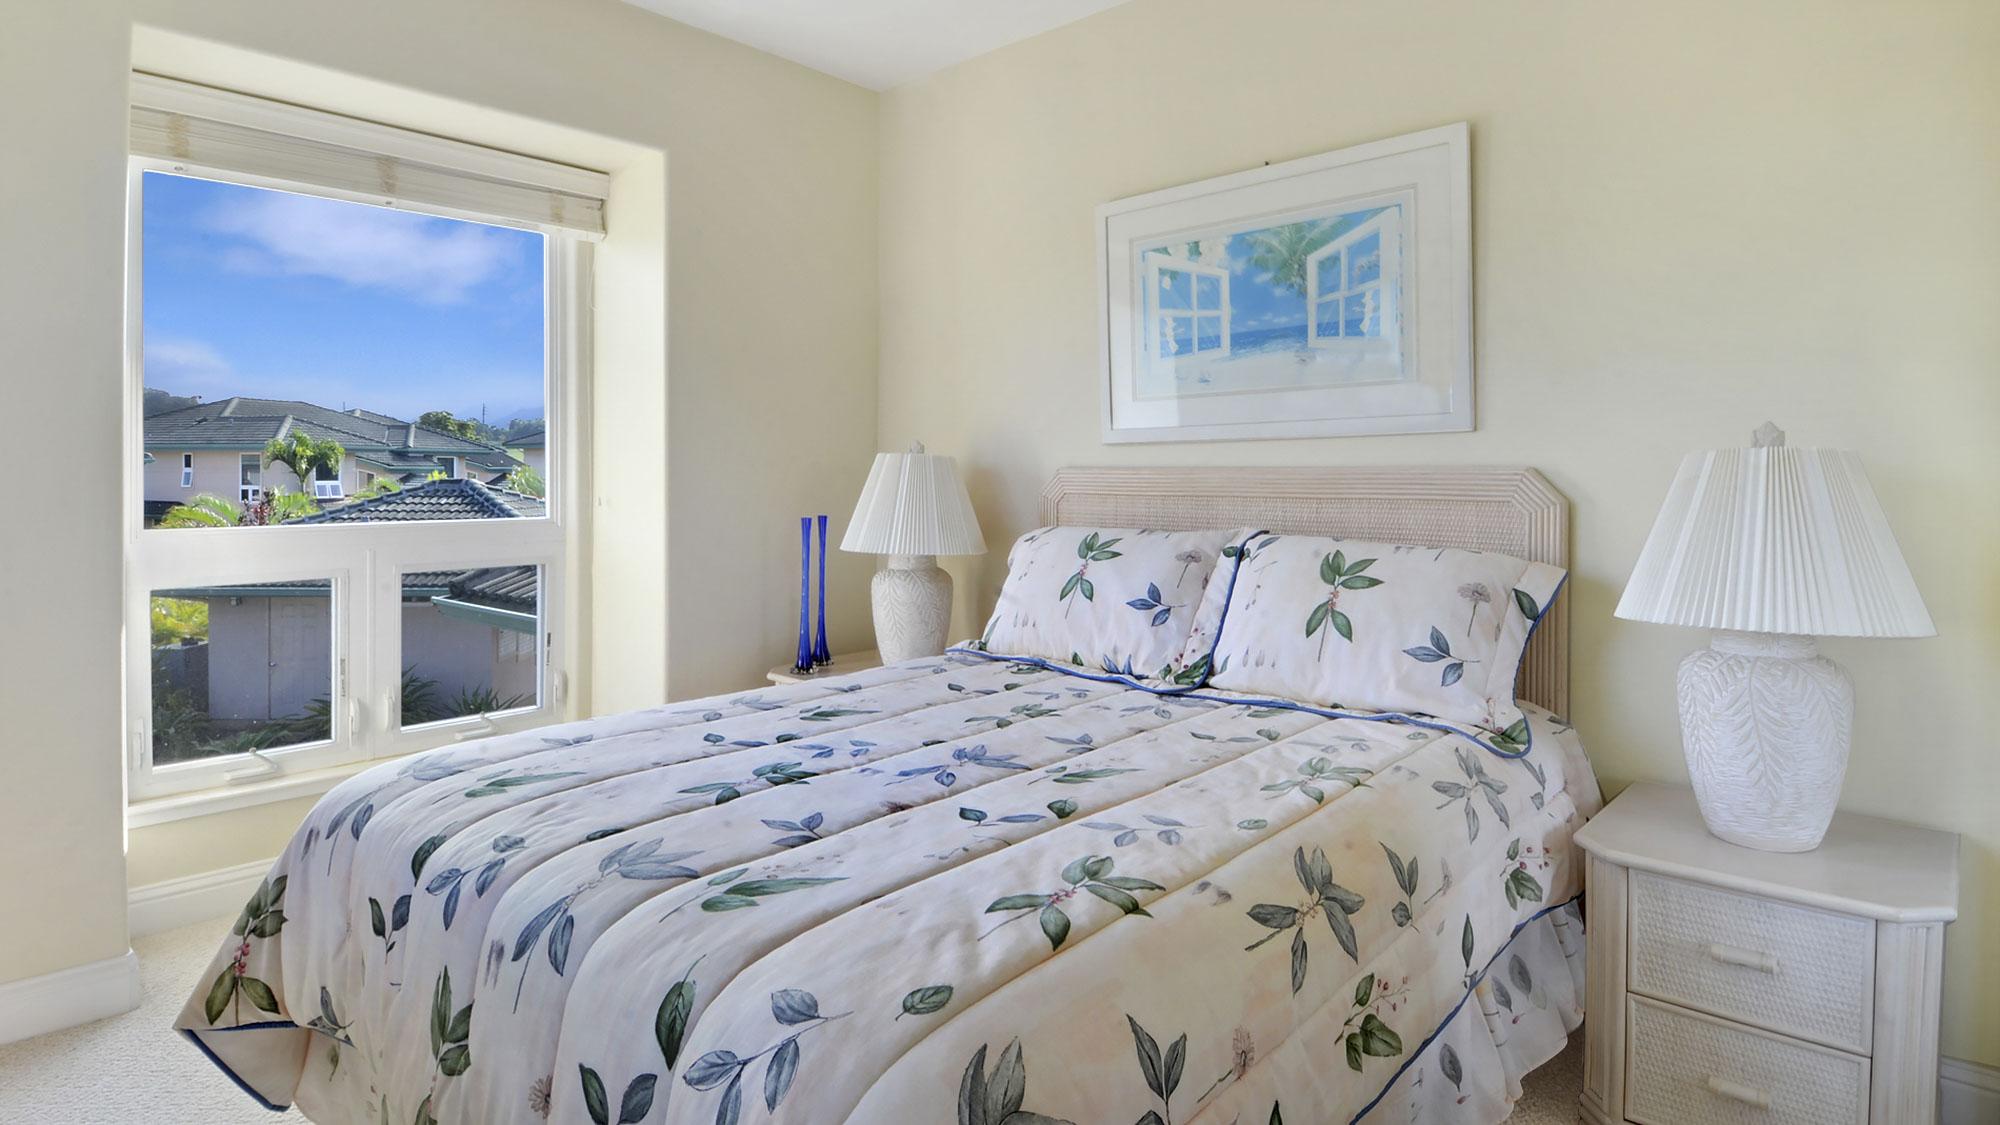 Villas on the Prince #39 - Third Guest Bedroom - Parrish Kauai